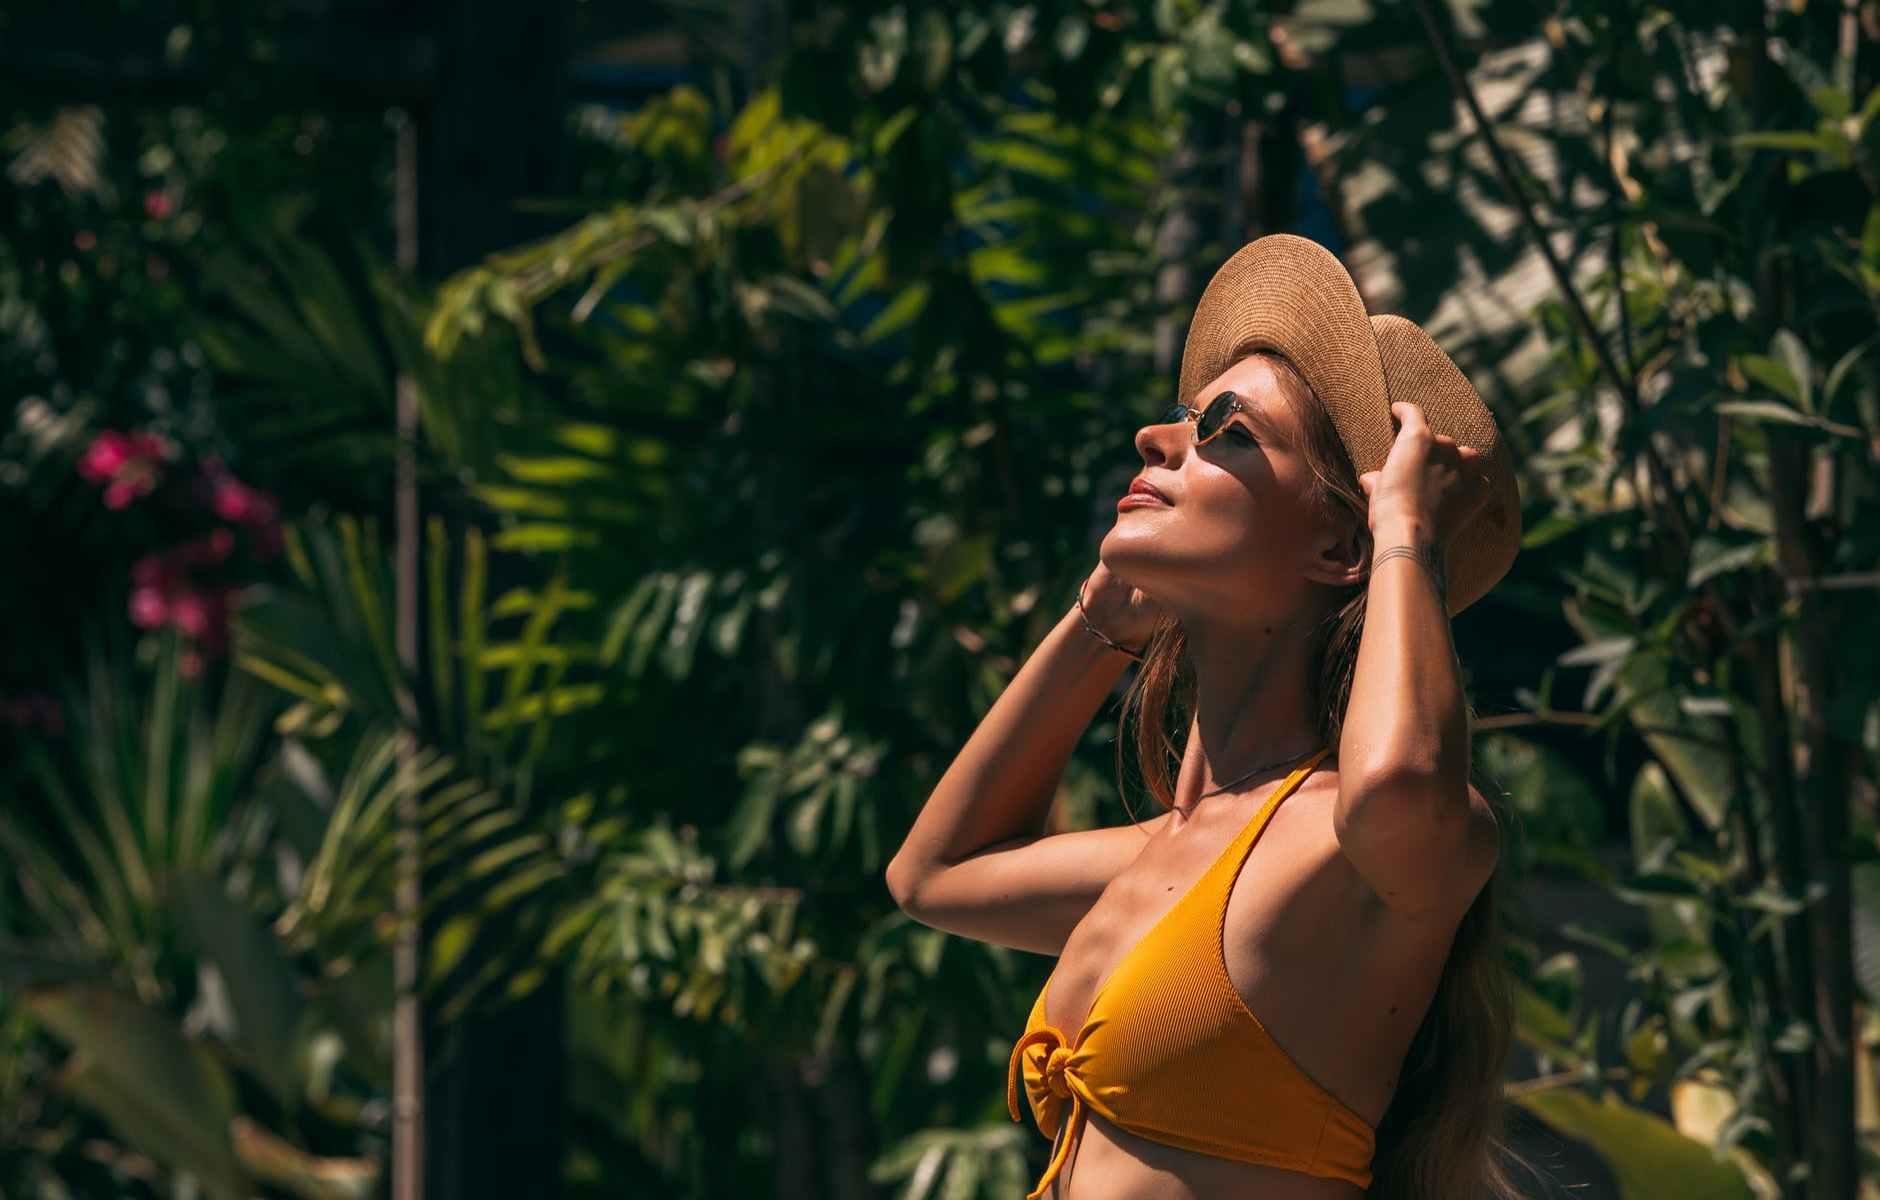 sunset fashion beach sunglasses